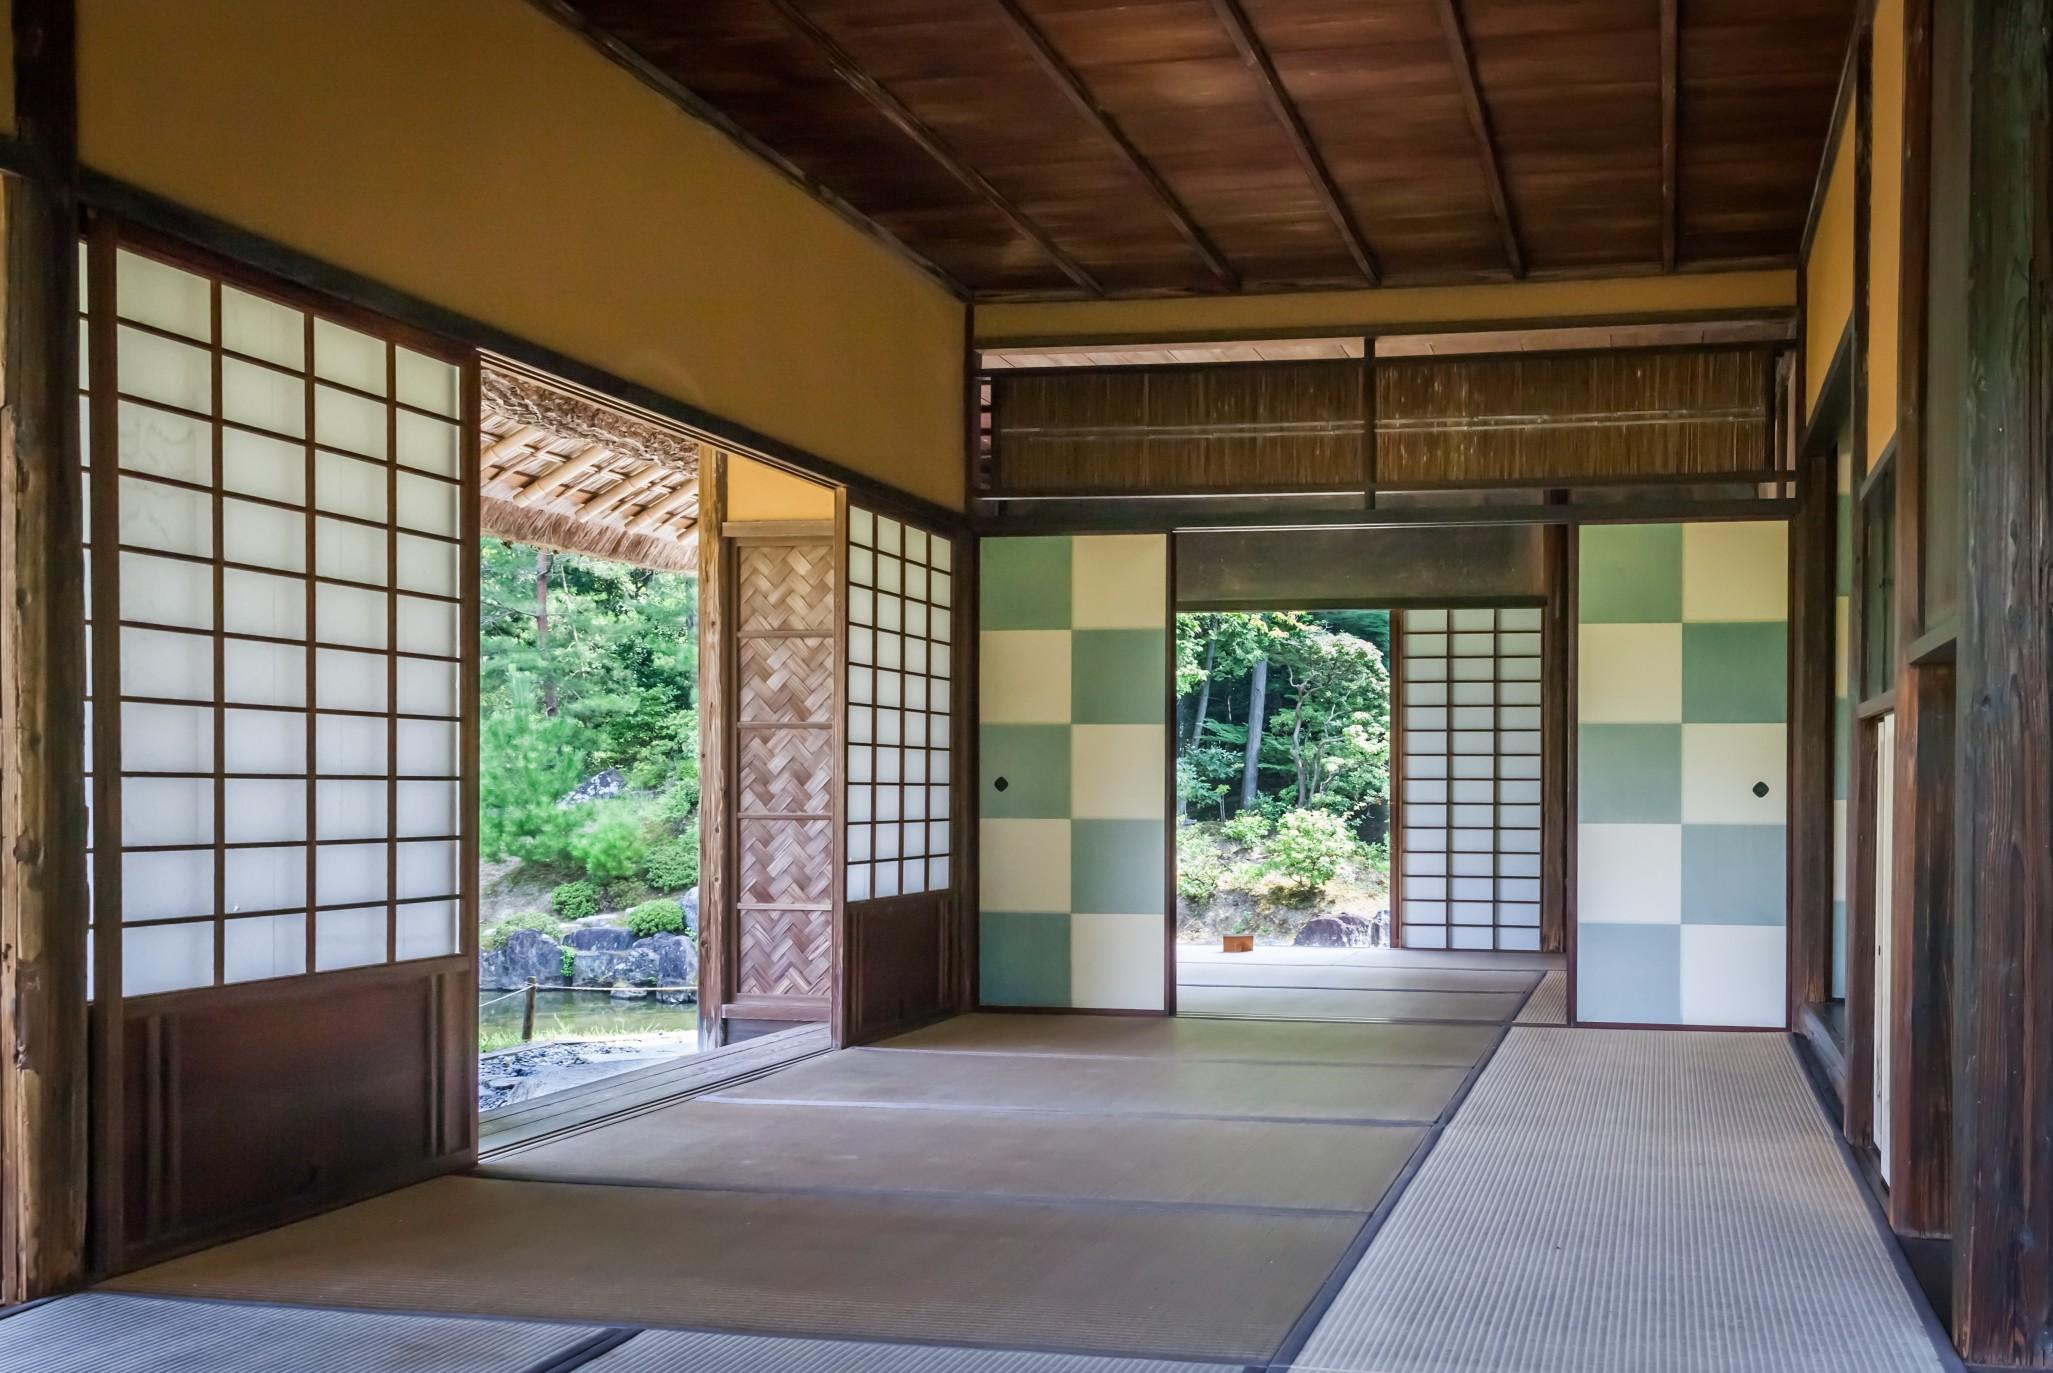 architecture asia building checkered pattern design garden house imperial villa interior japan t20 eV0LKW